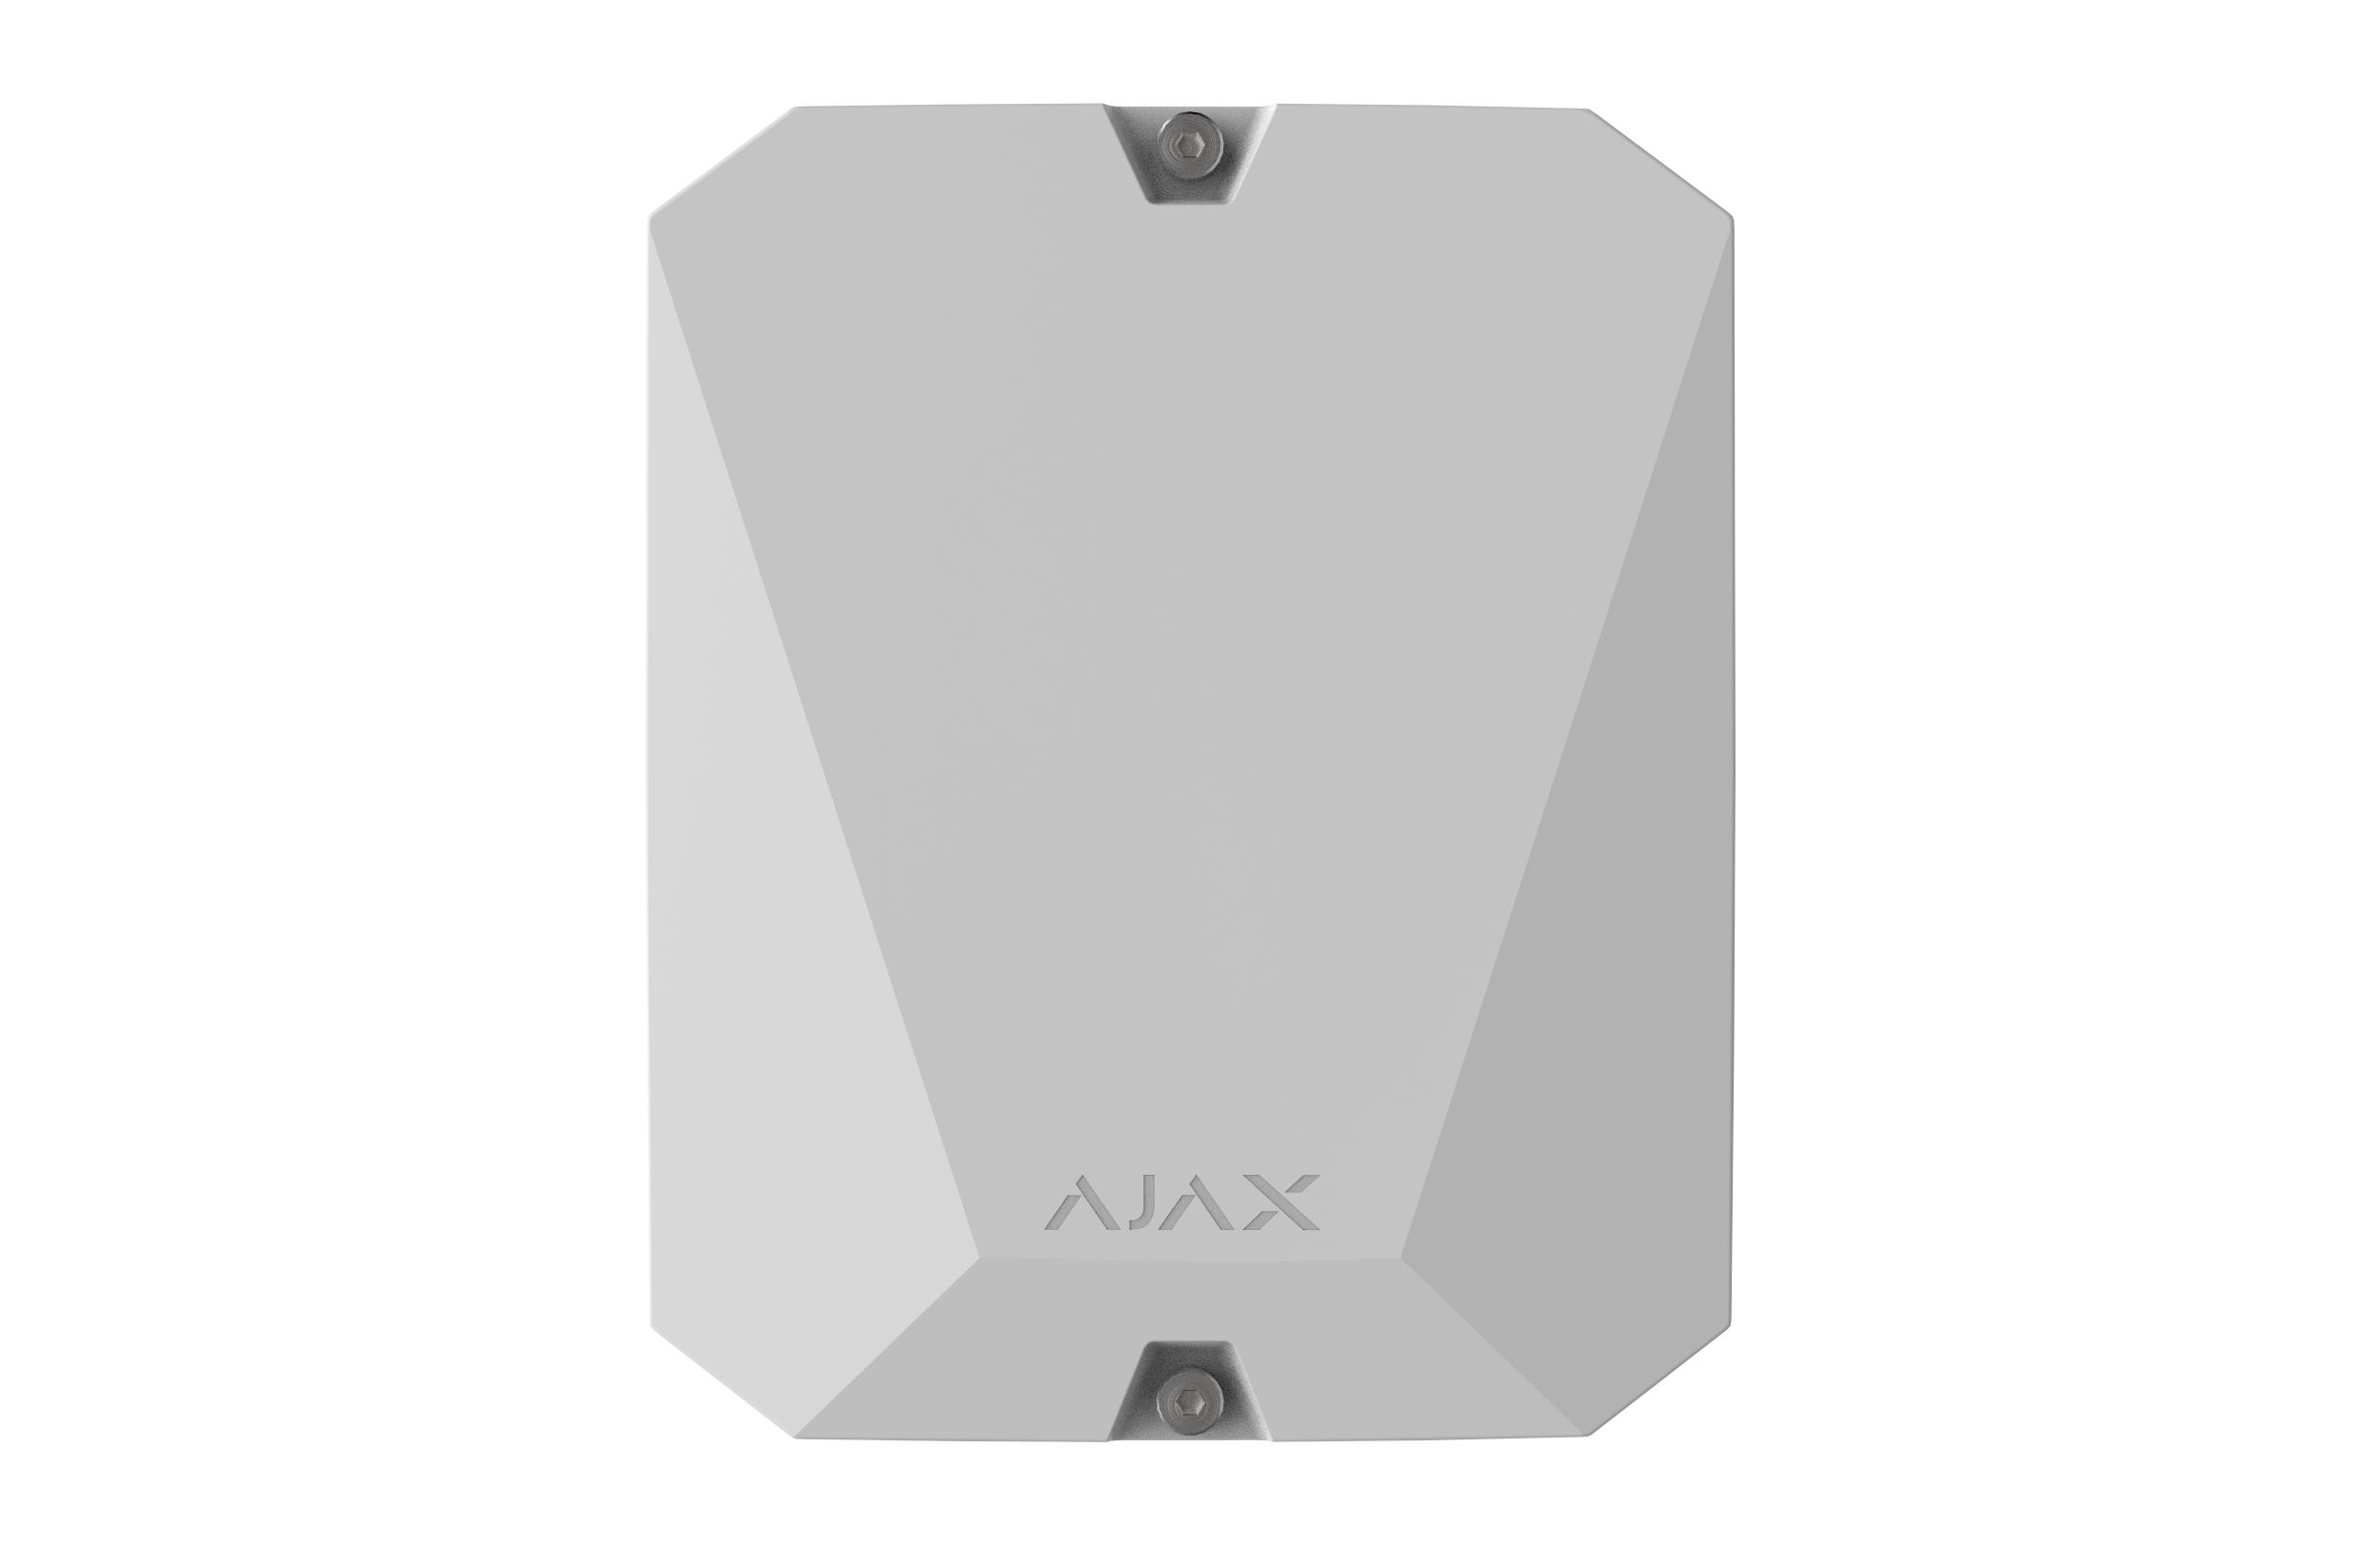 AJAX SYSTEMS - MULTI TRANSMITTER ΛΕΥΚΟ